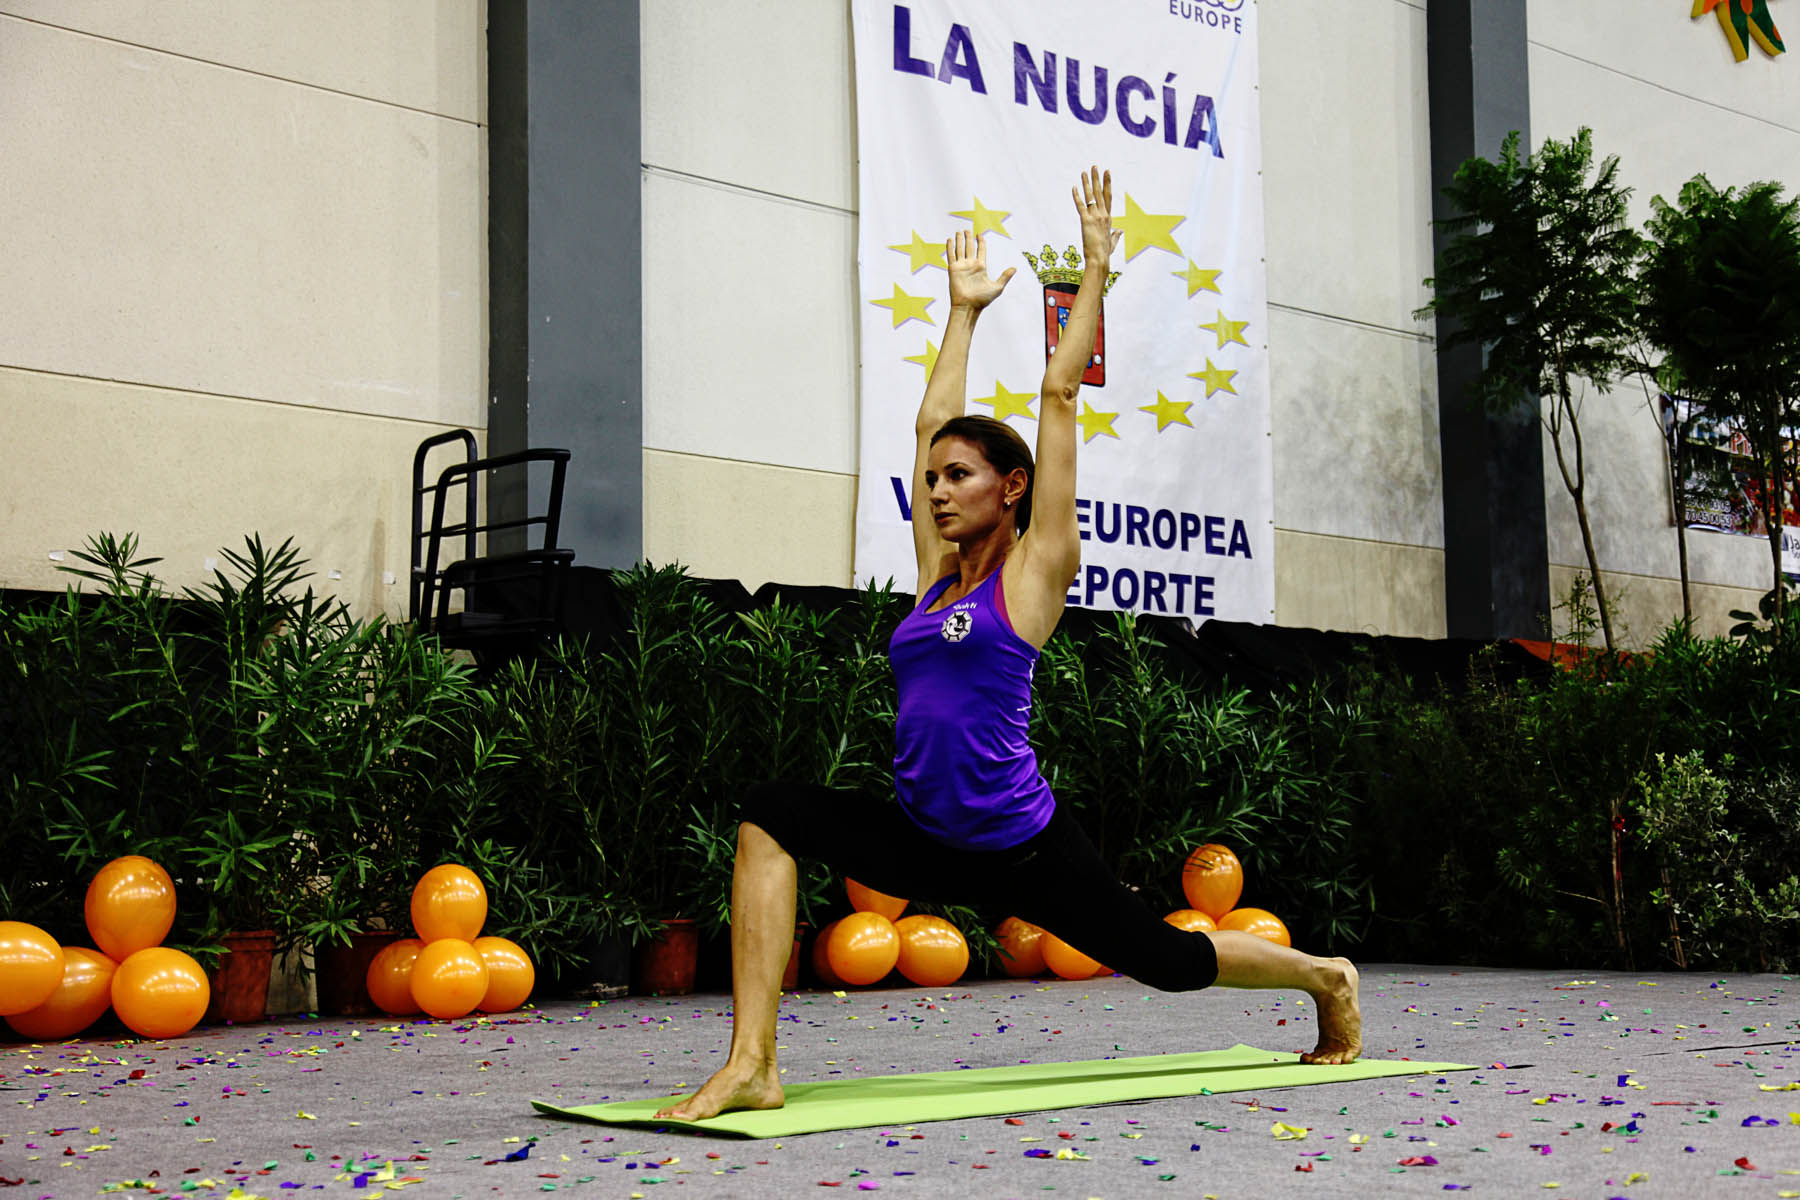 shakti yoga masage martial arts dance thai restaurant albir benidorm altea lanucia calpe alfas 18